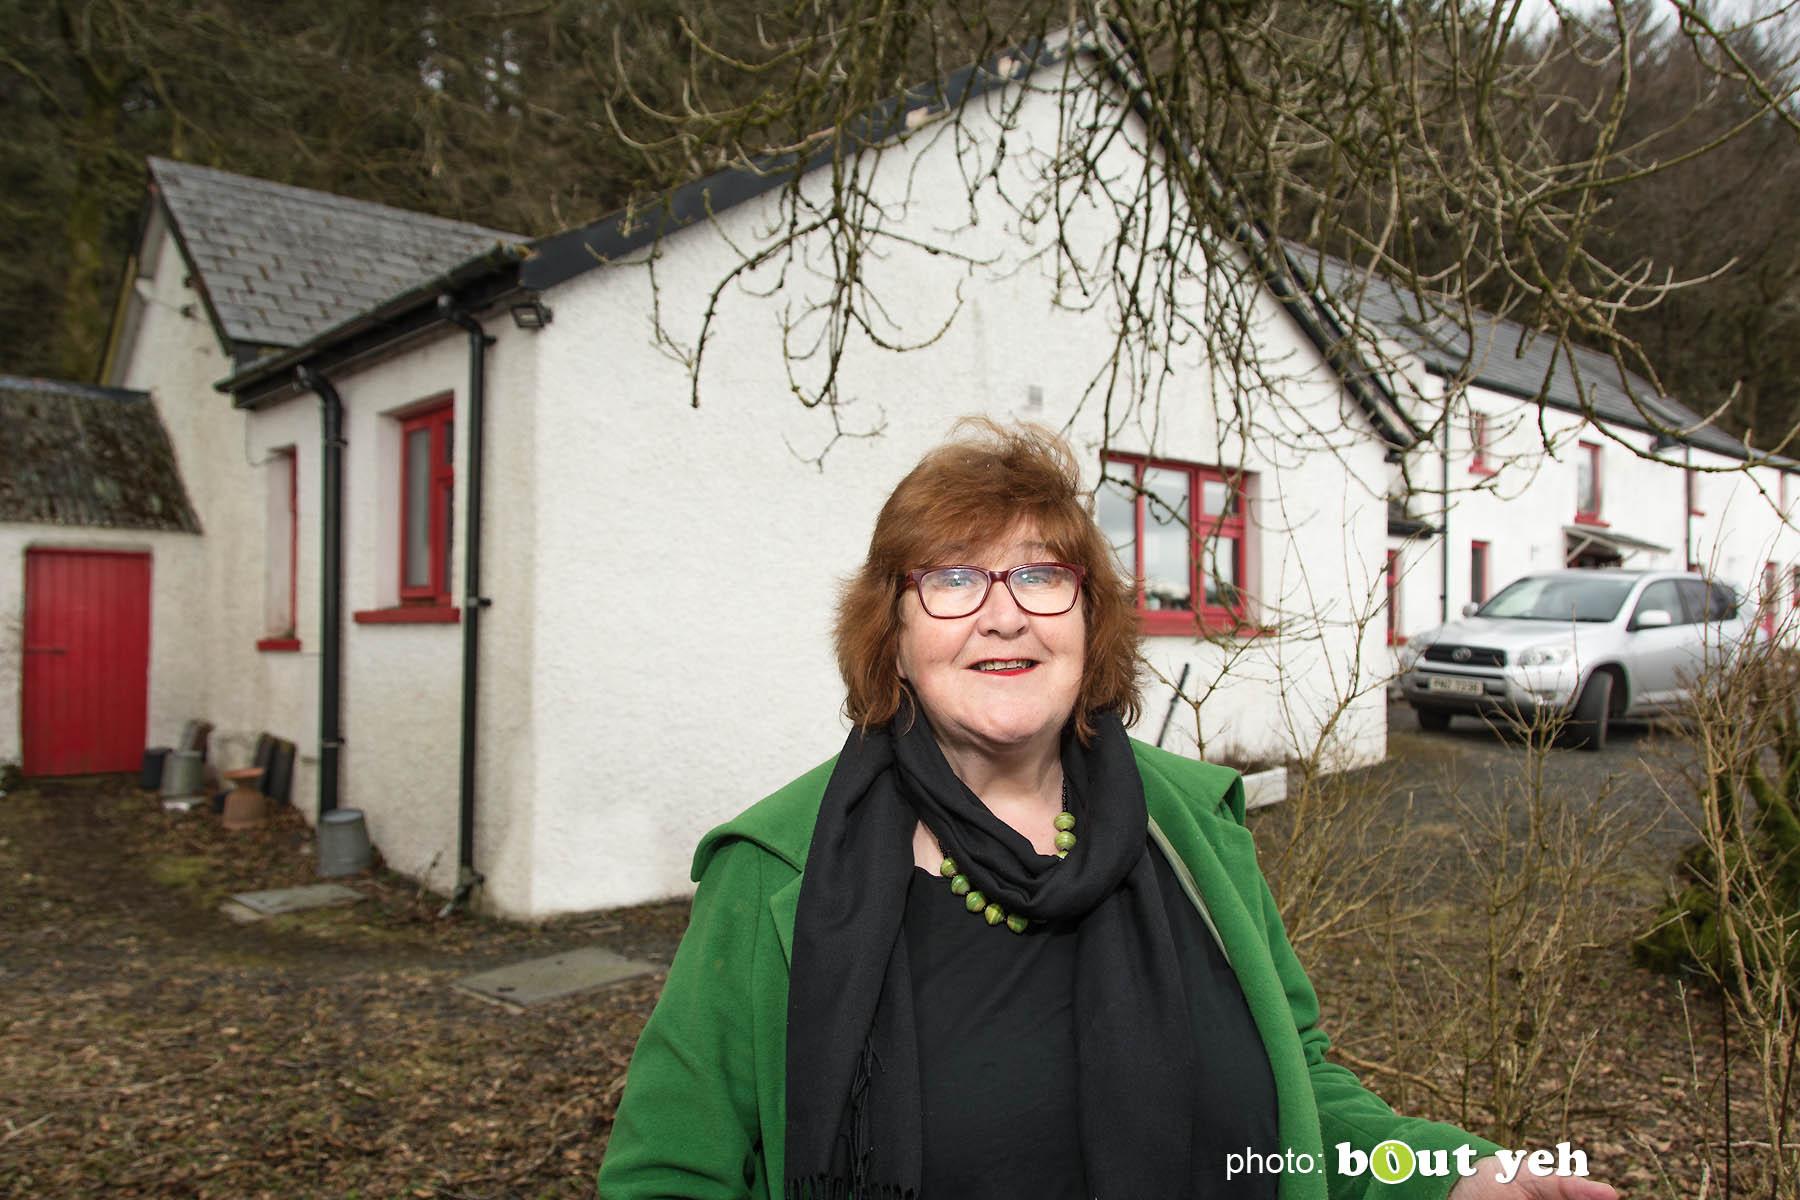 Liz Weir, Ballyeamon Barn Hostel, Glenariff, Northern Ireland - photo 1014.